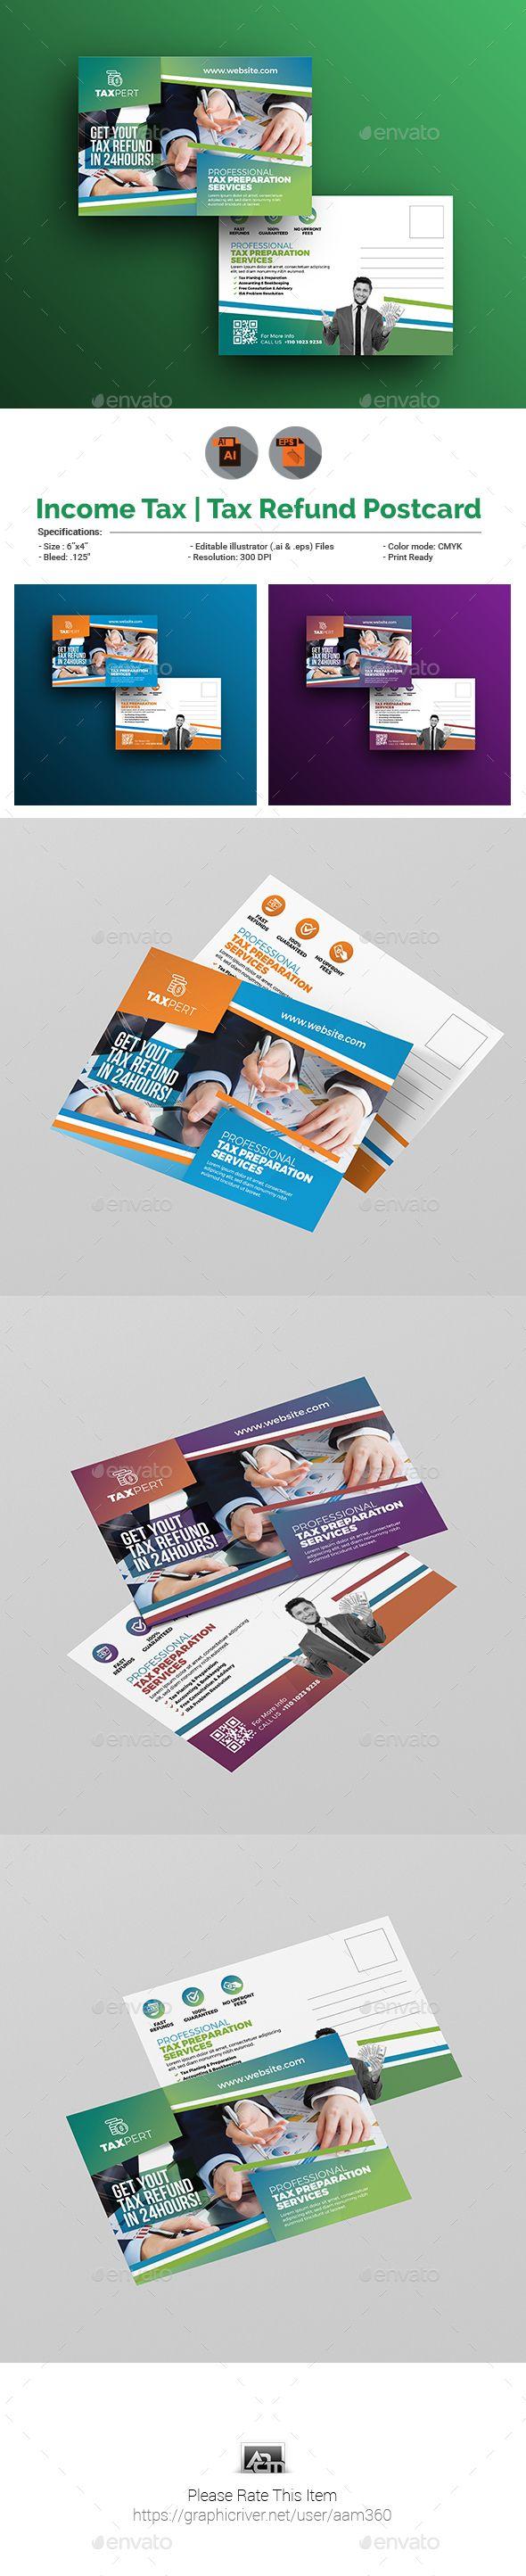 Income TaxTax Refund Postcard Template Postcard